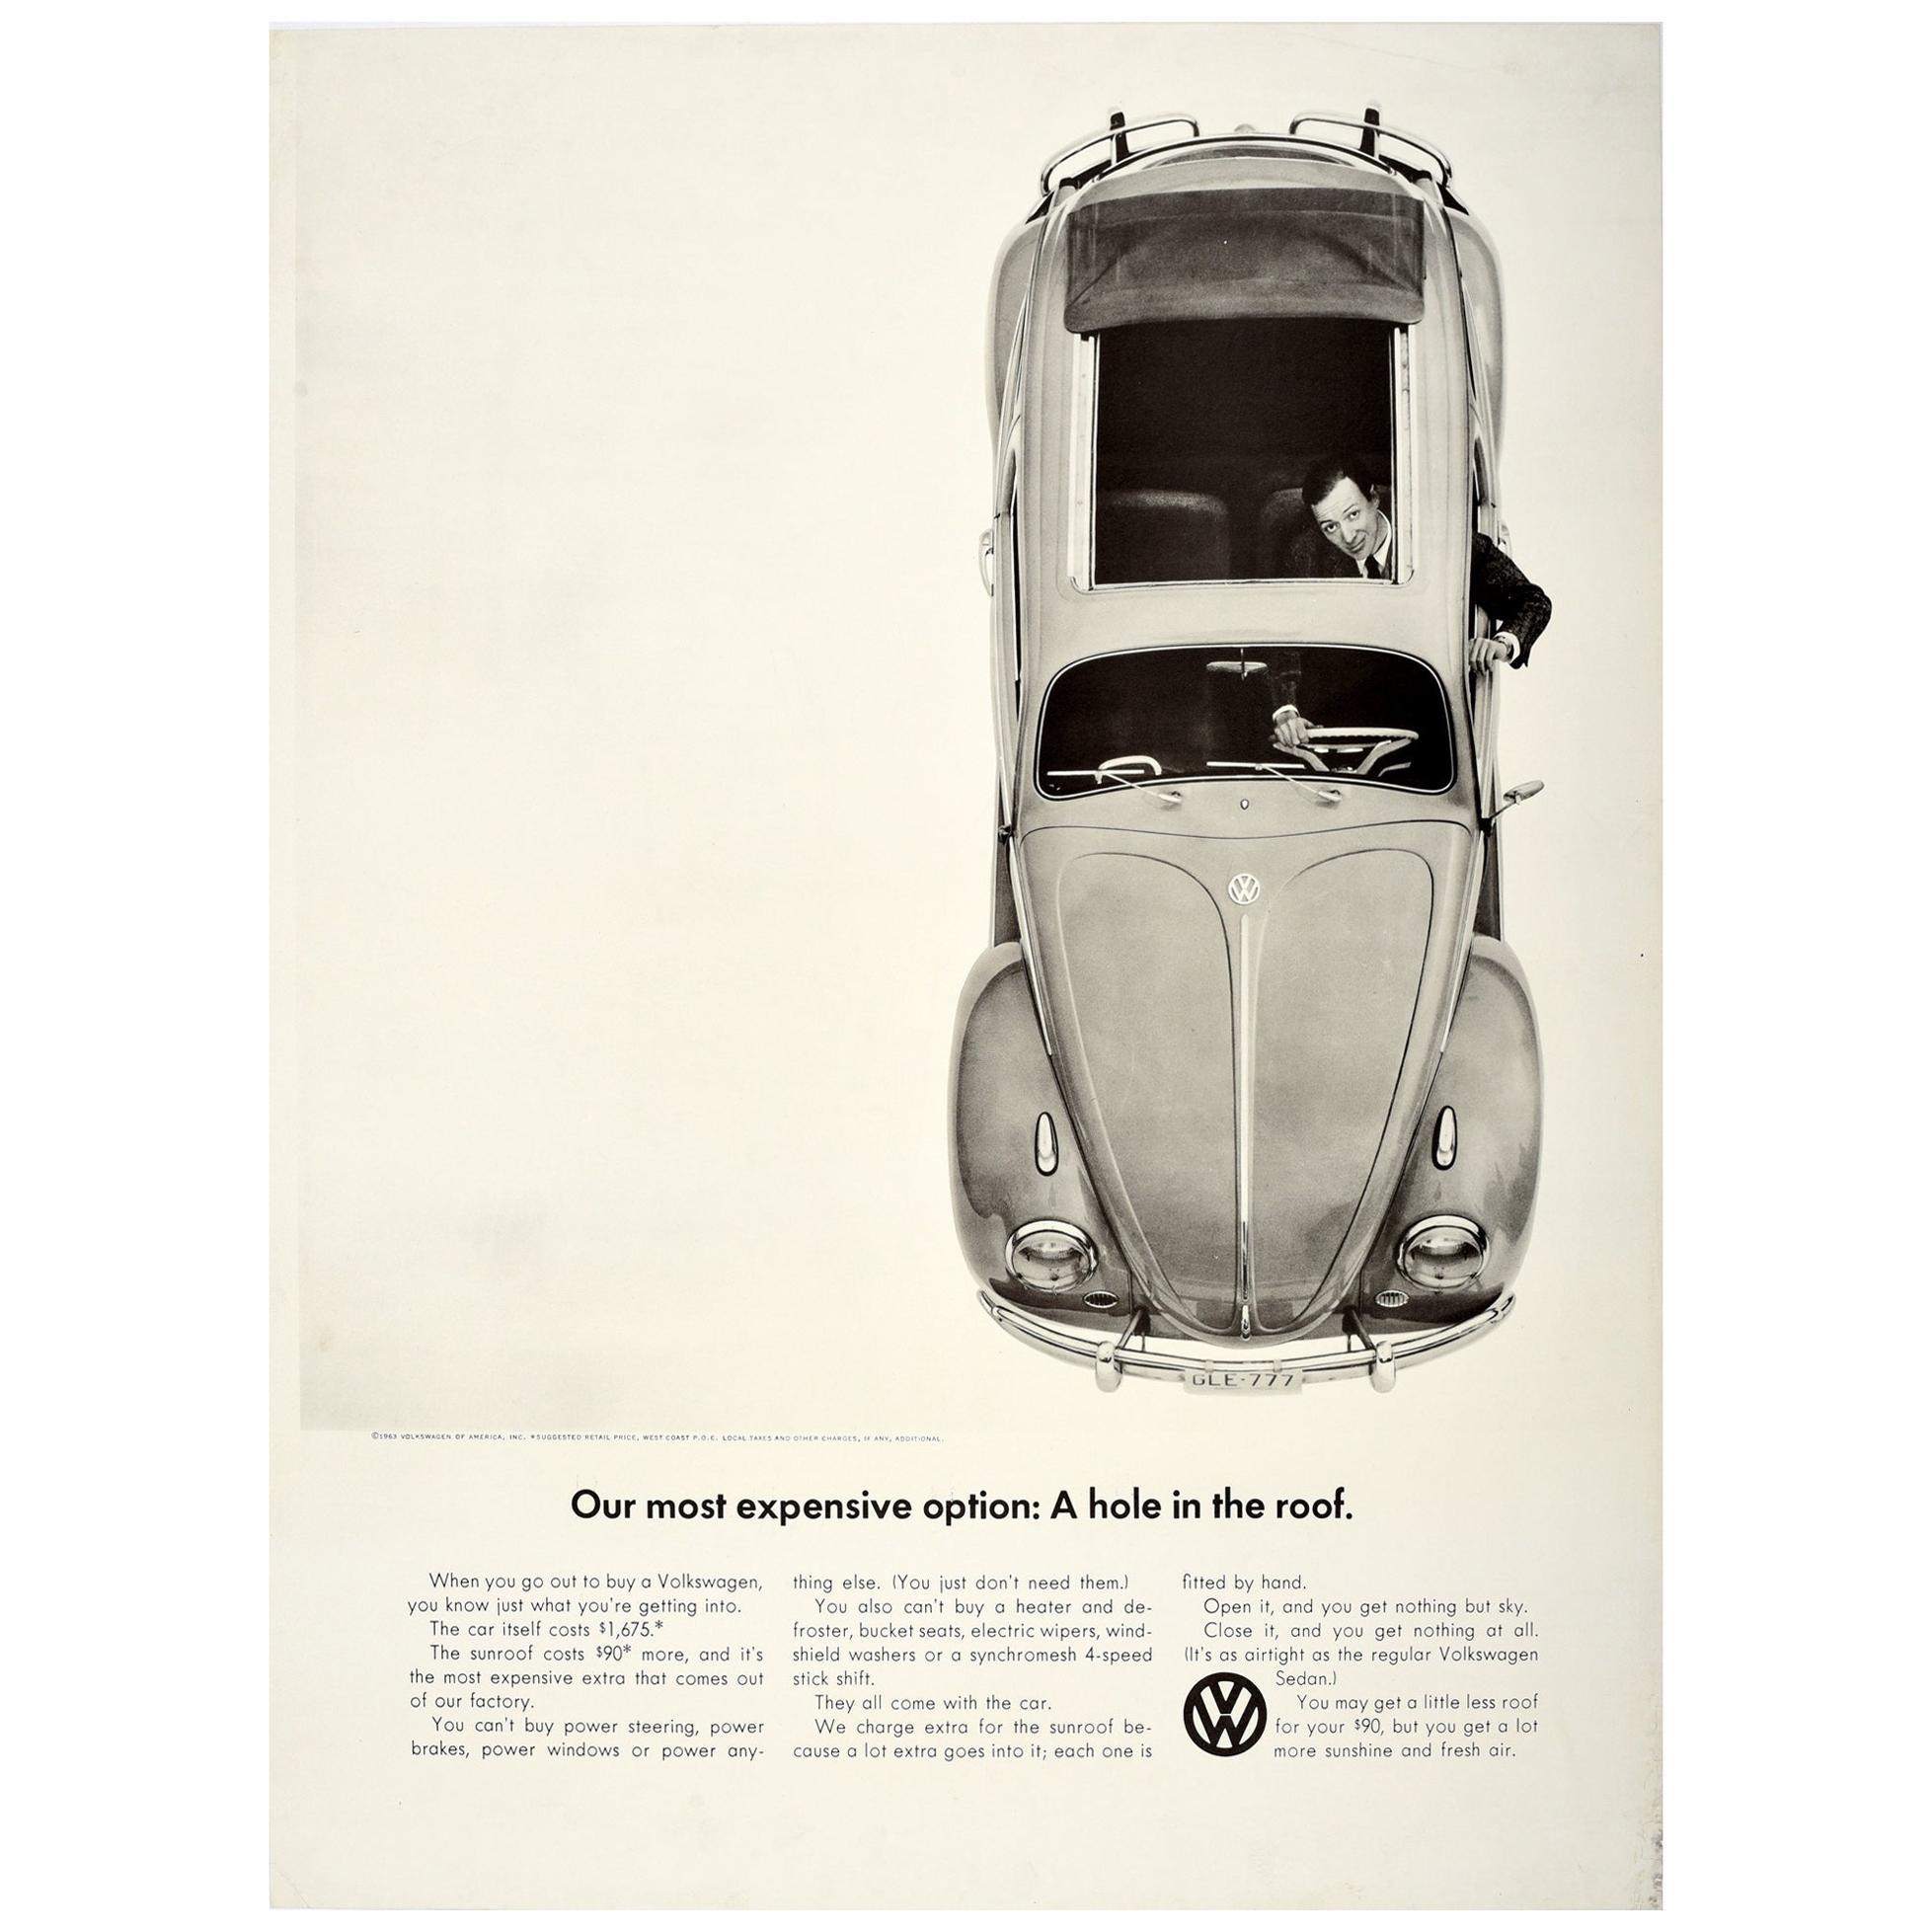 Original Vintage Poster Volkswagen Car Showroom Ad VW Beetle Hole In The Roof